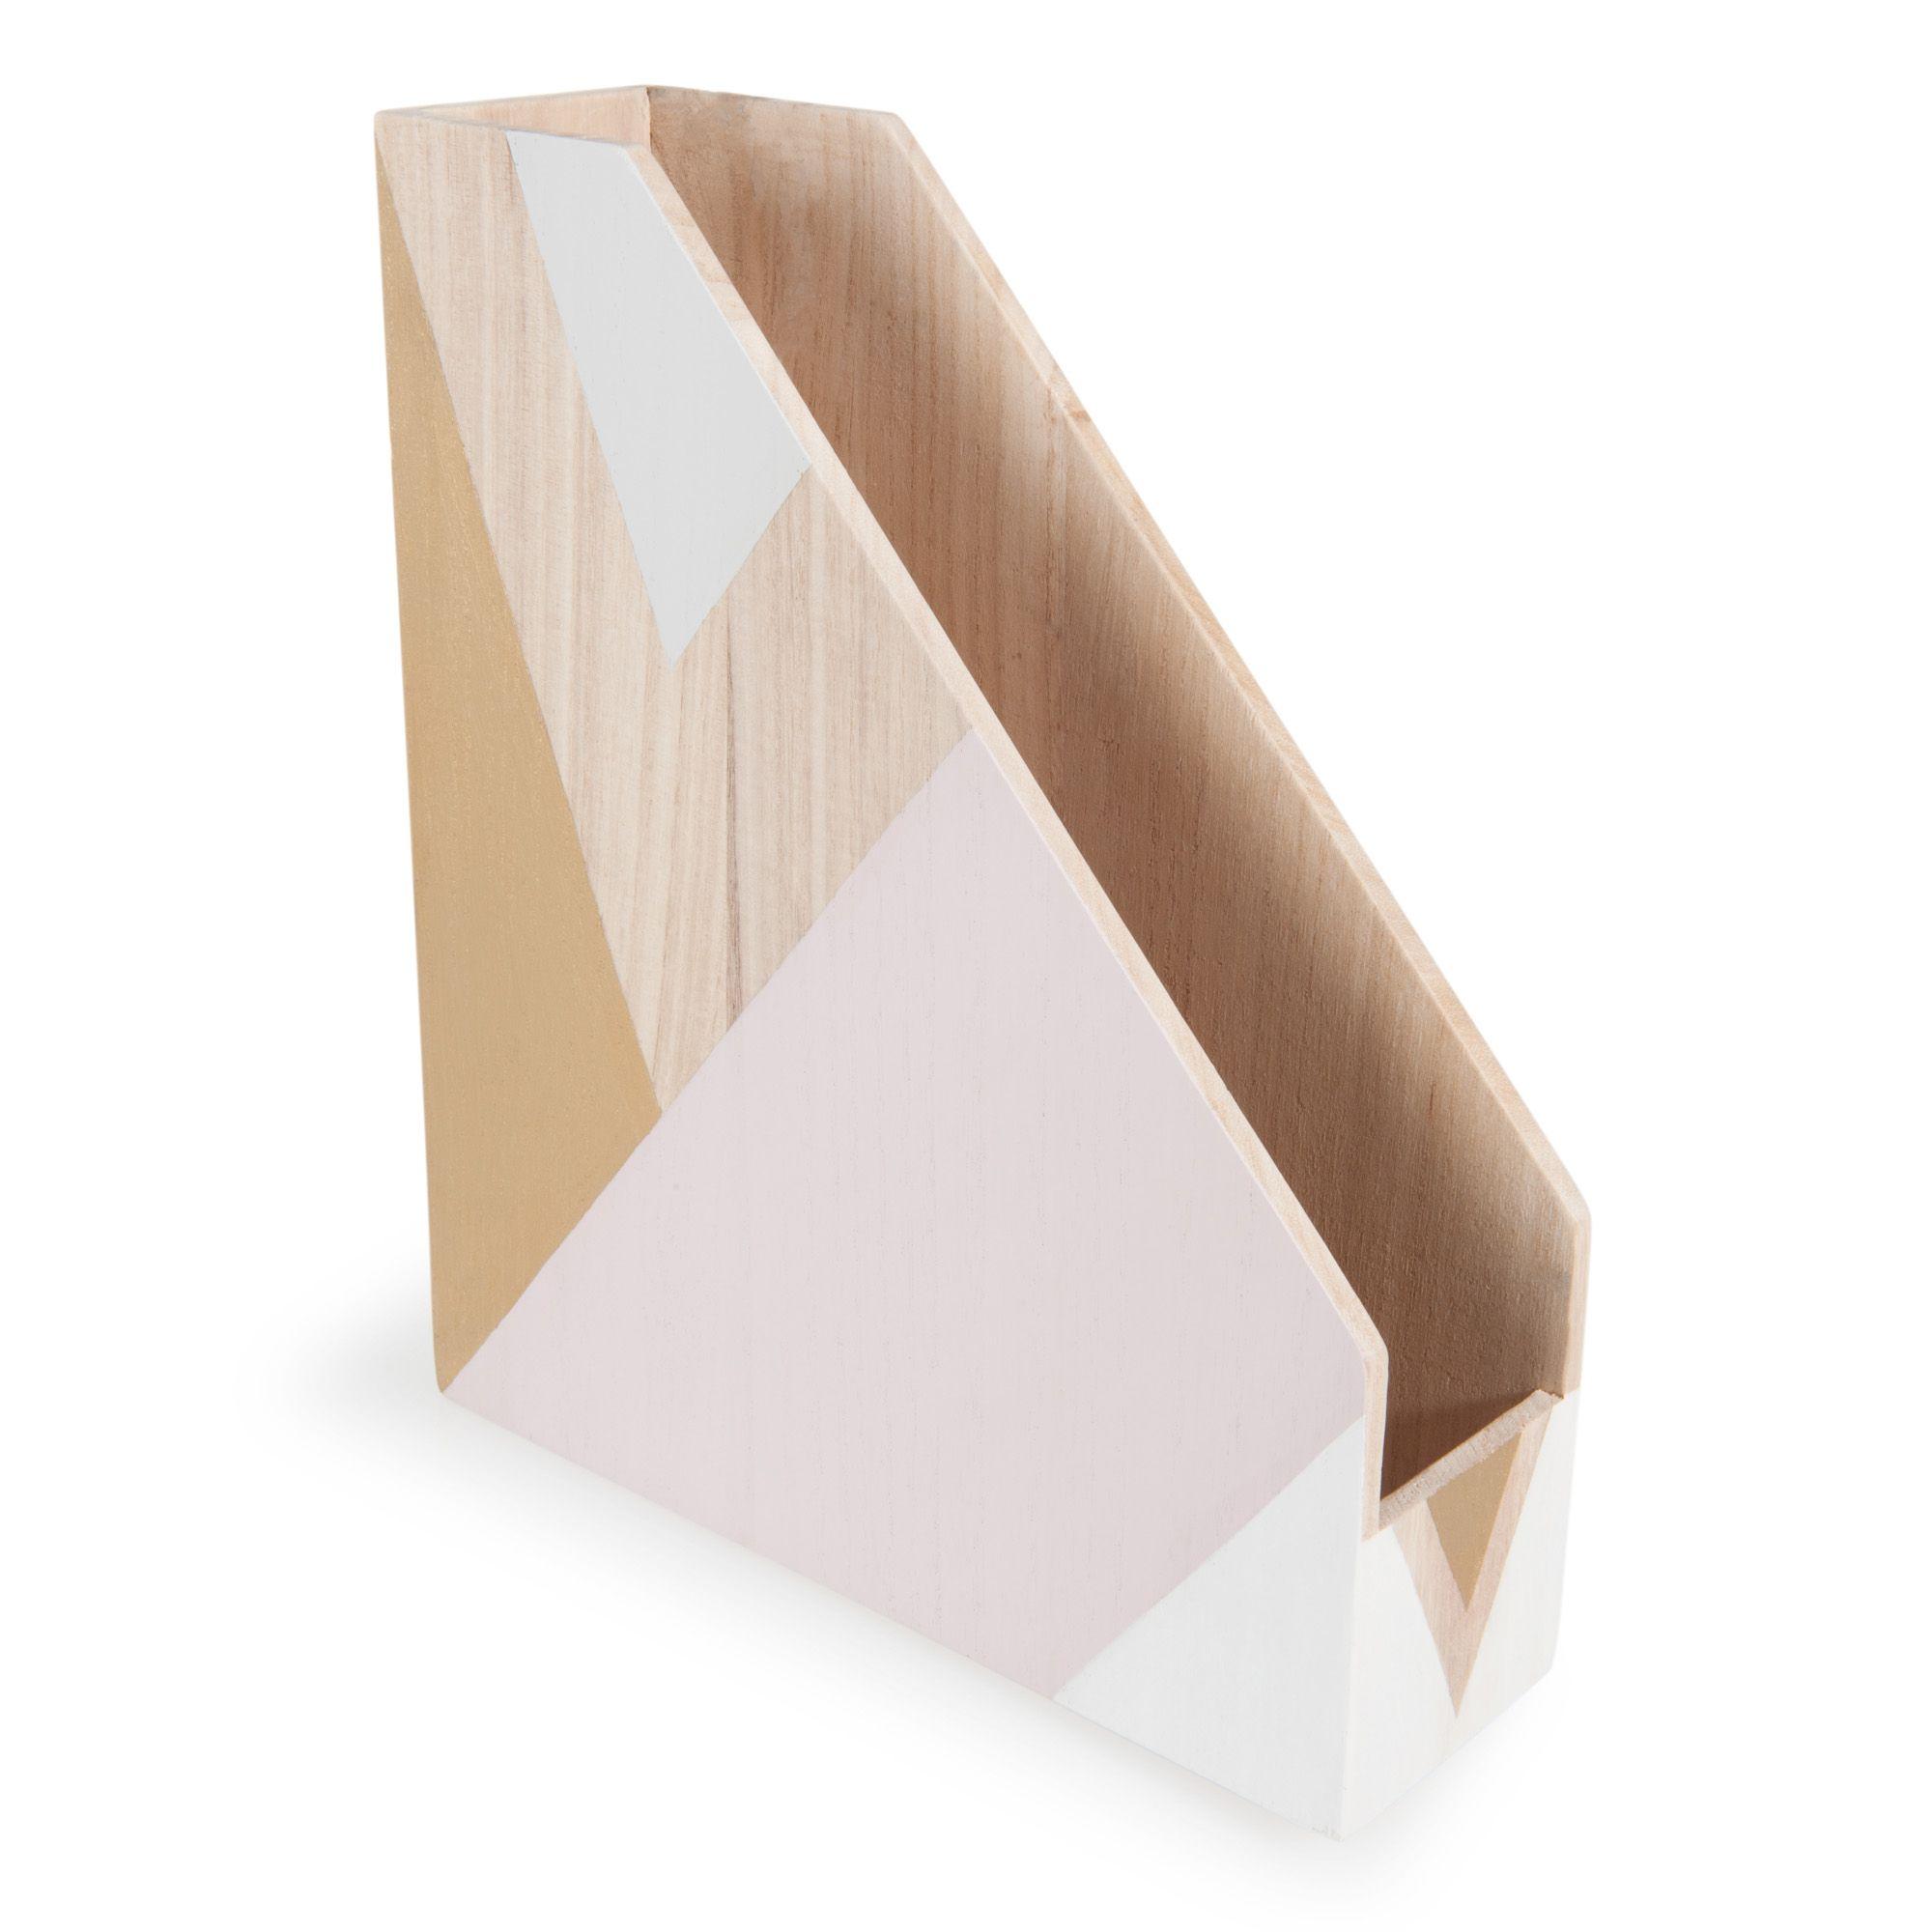 rangement documents maison top rangement document bureau boarte de rangement bureau classement. Black Bedroom Furniture Sets. Home Design Ideas